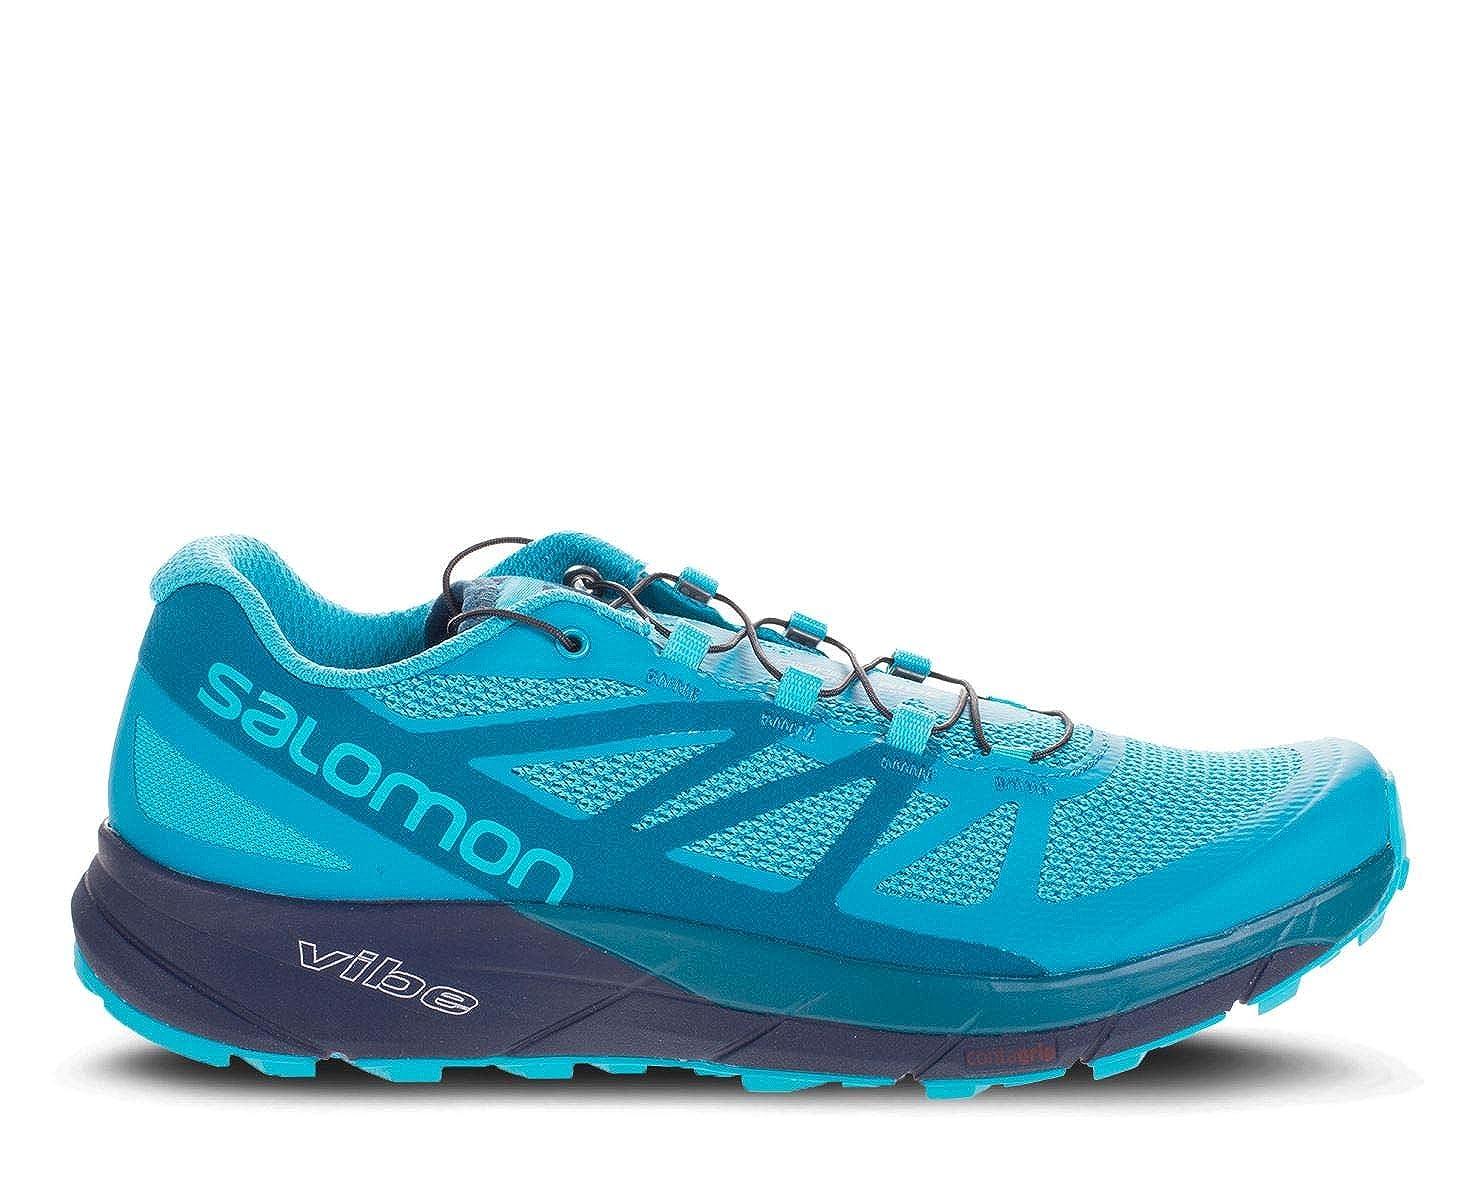 Salomon sense ride w amazon shoes viola senza tacco